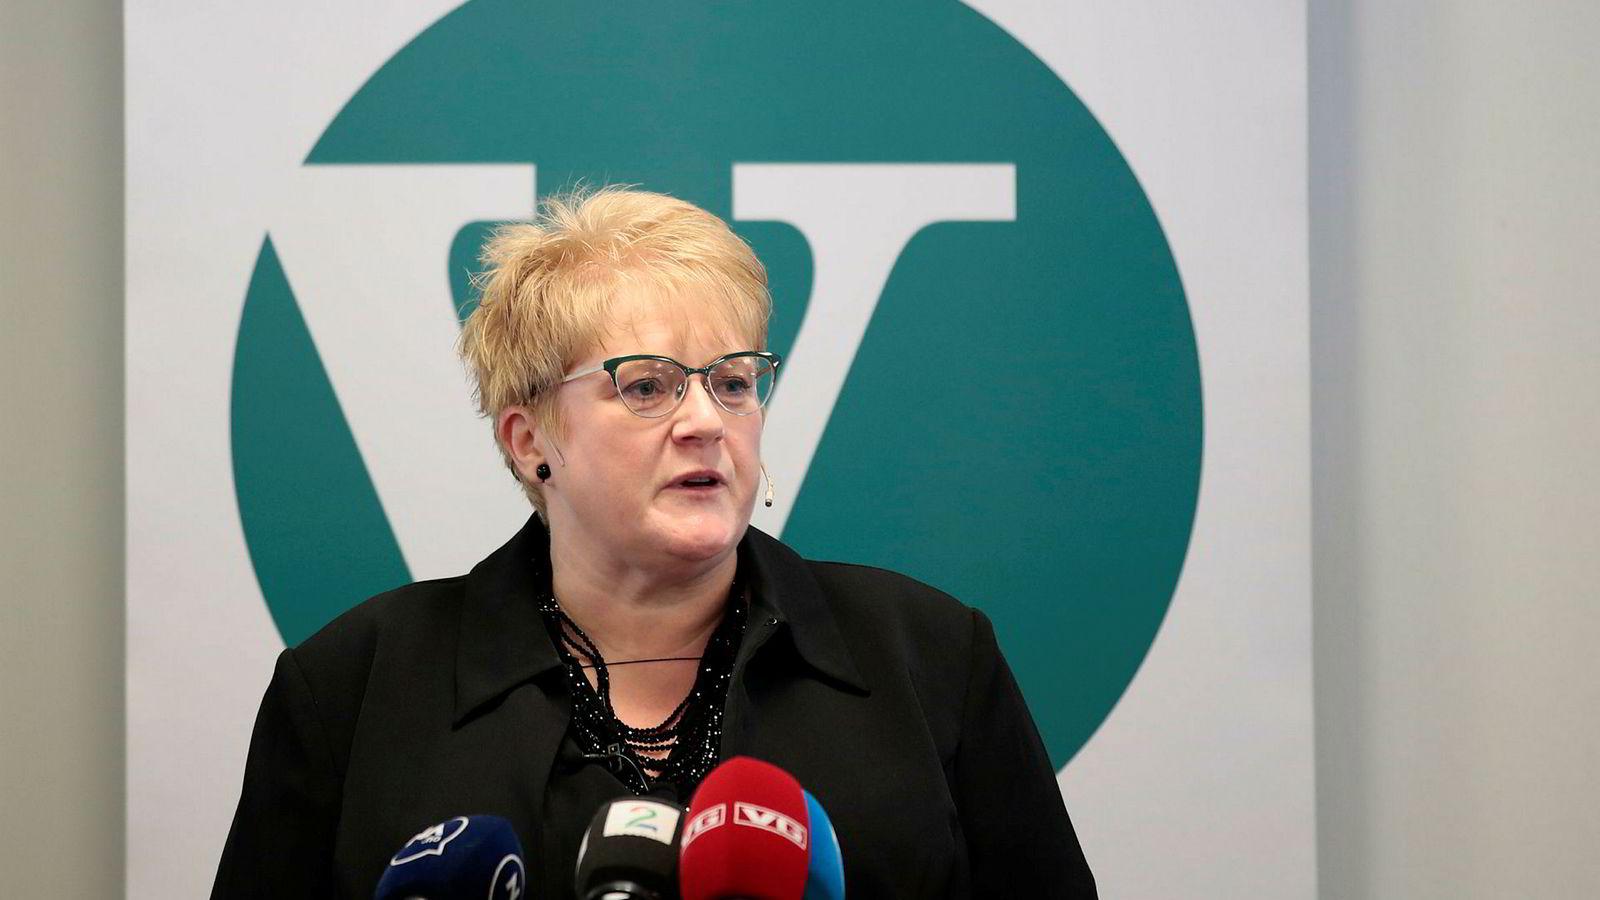 Det har stormet rundt Venstre-leder Trine Skei Grande den siste uken. Lørdag møtte hun partiets landsstyre i Oslo.